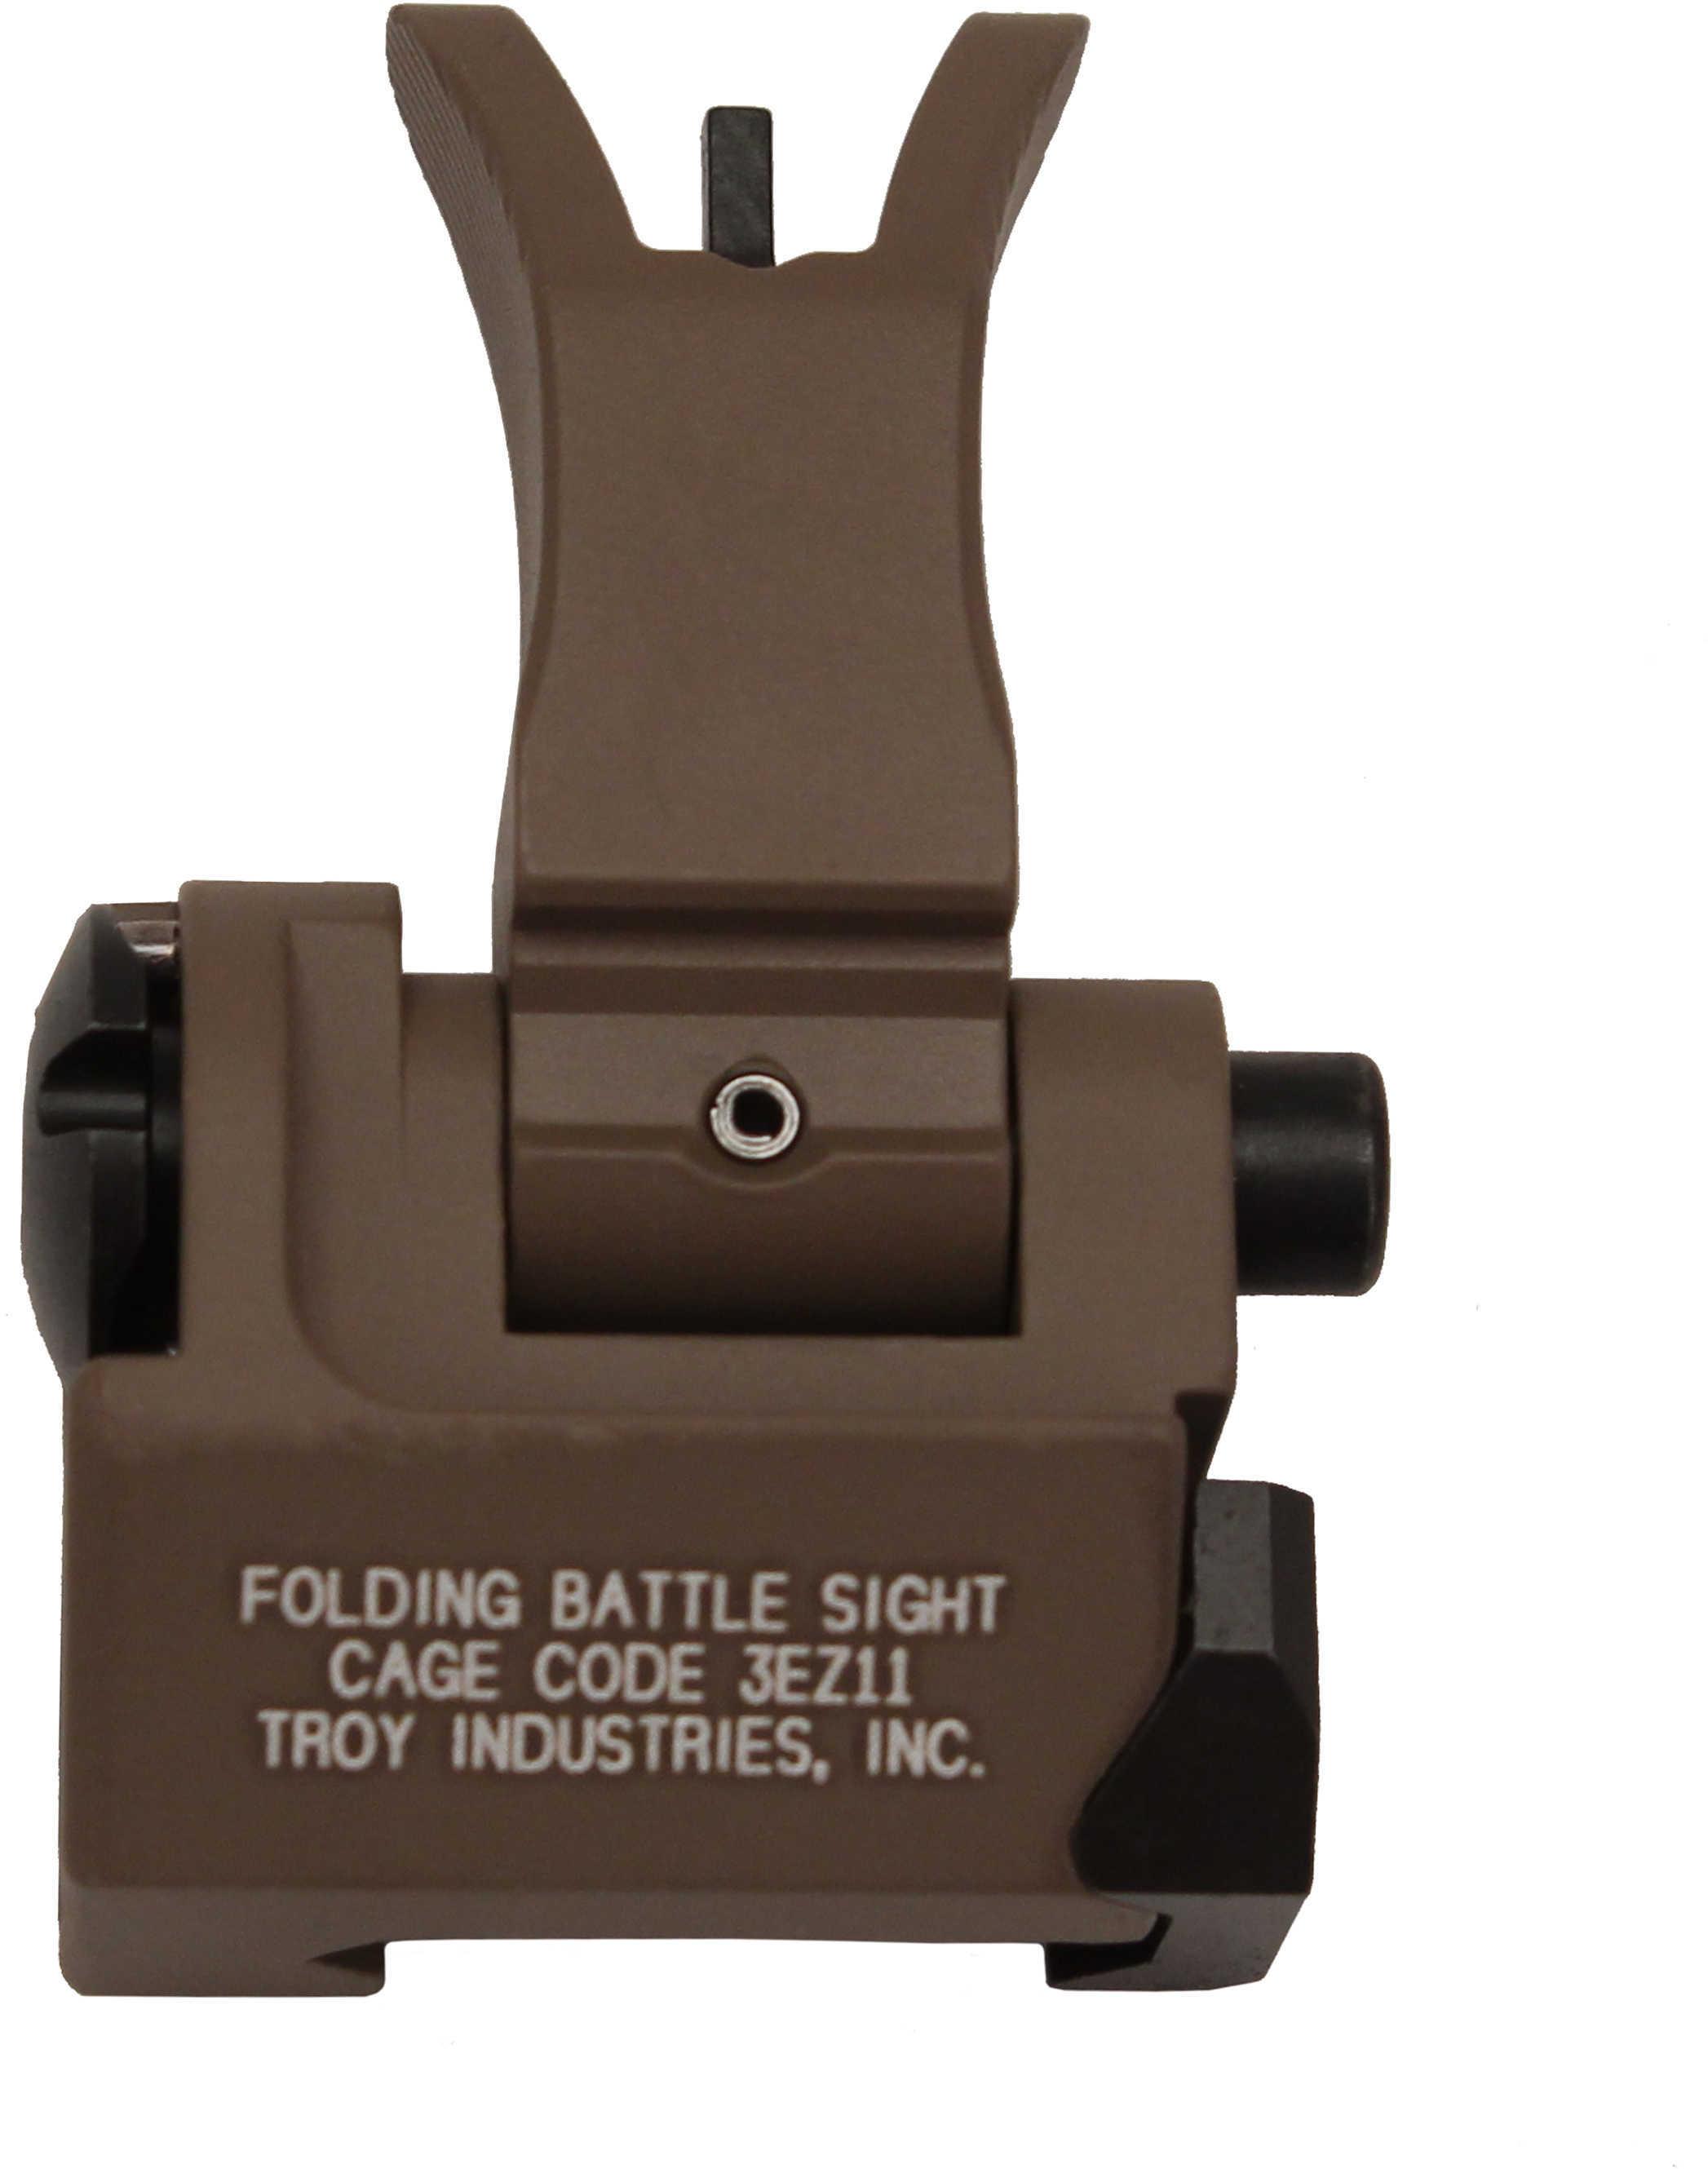 Troy BattleSight Folding Front Sight M4 style Picatinny Flat Dark Earth Finish SSIG-FBS-FMFT-00